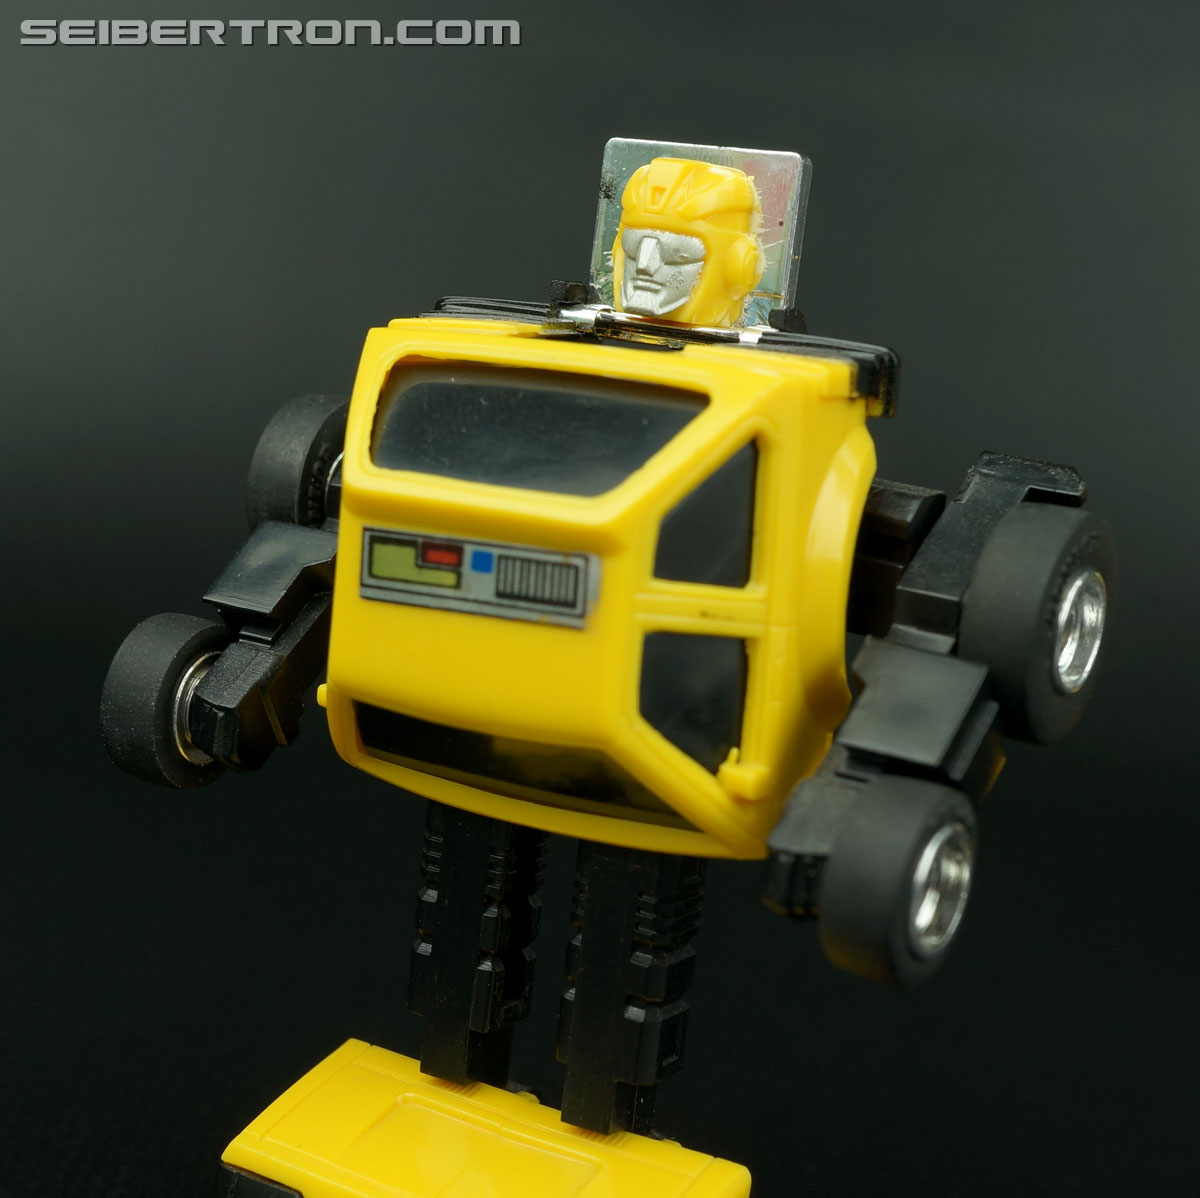 Transformers Micro Change MC04 Mini CAR Robo 02 XG1500 (Yellow) (Image #52 of 70)